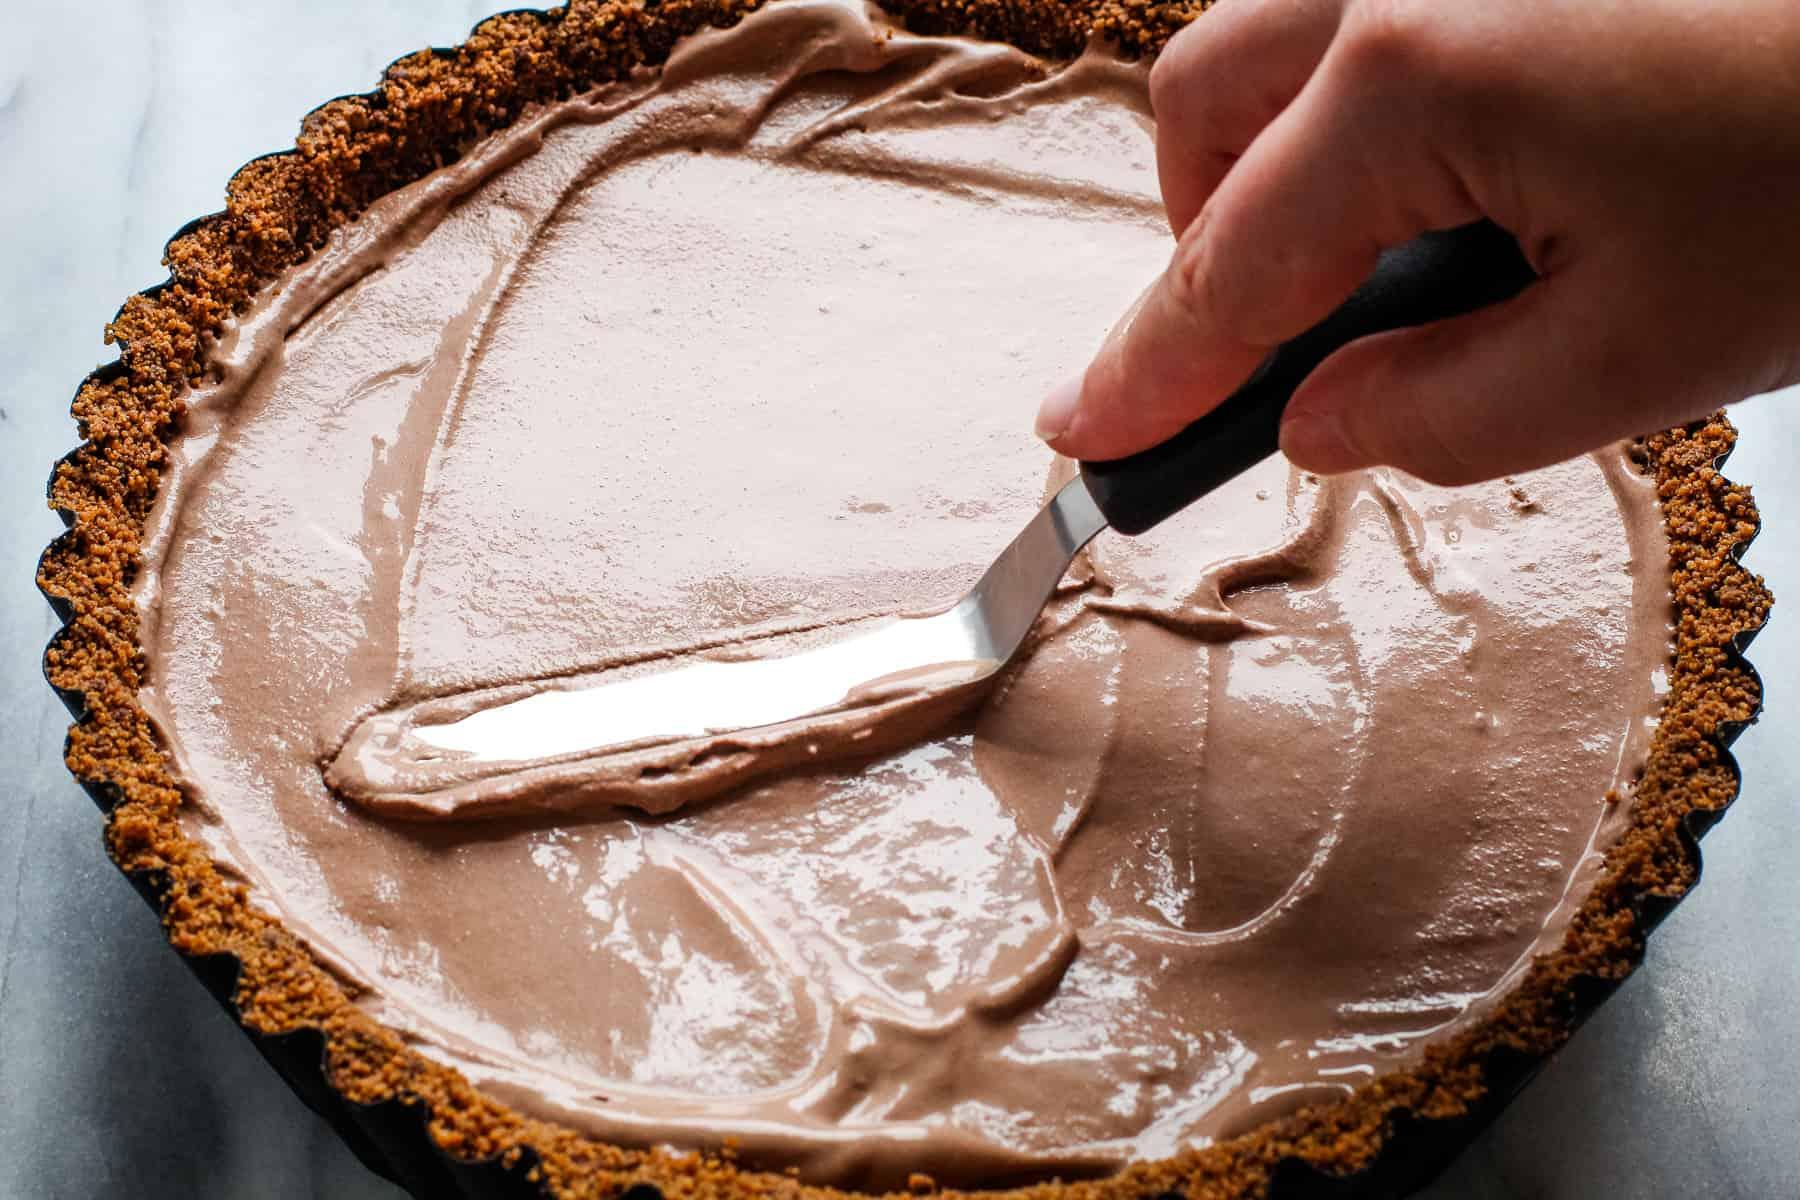 Smoothing over ice cream on Baked Alaska recipe